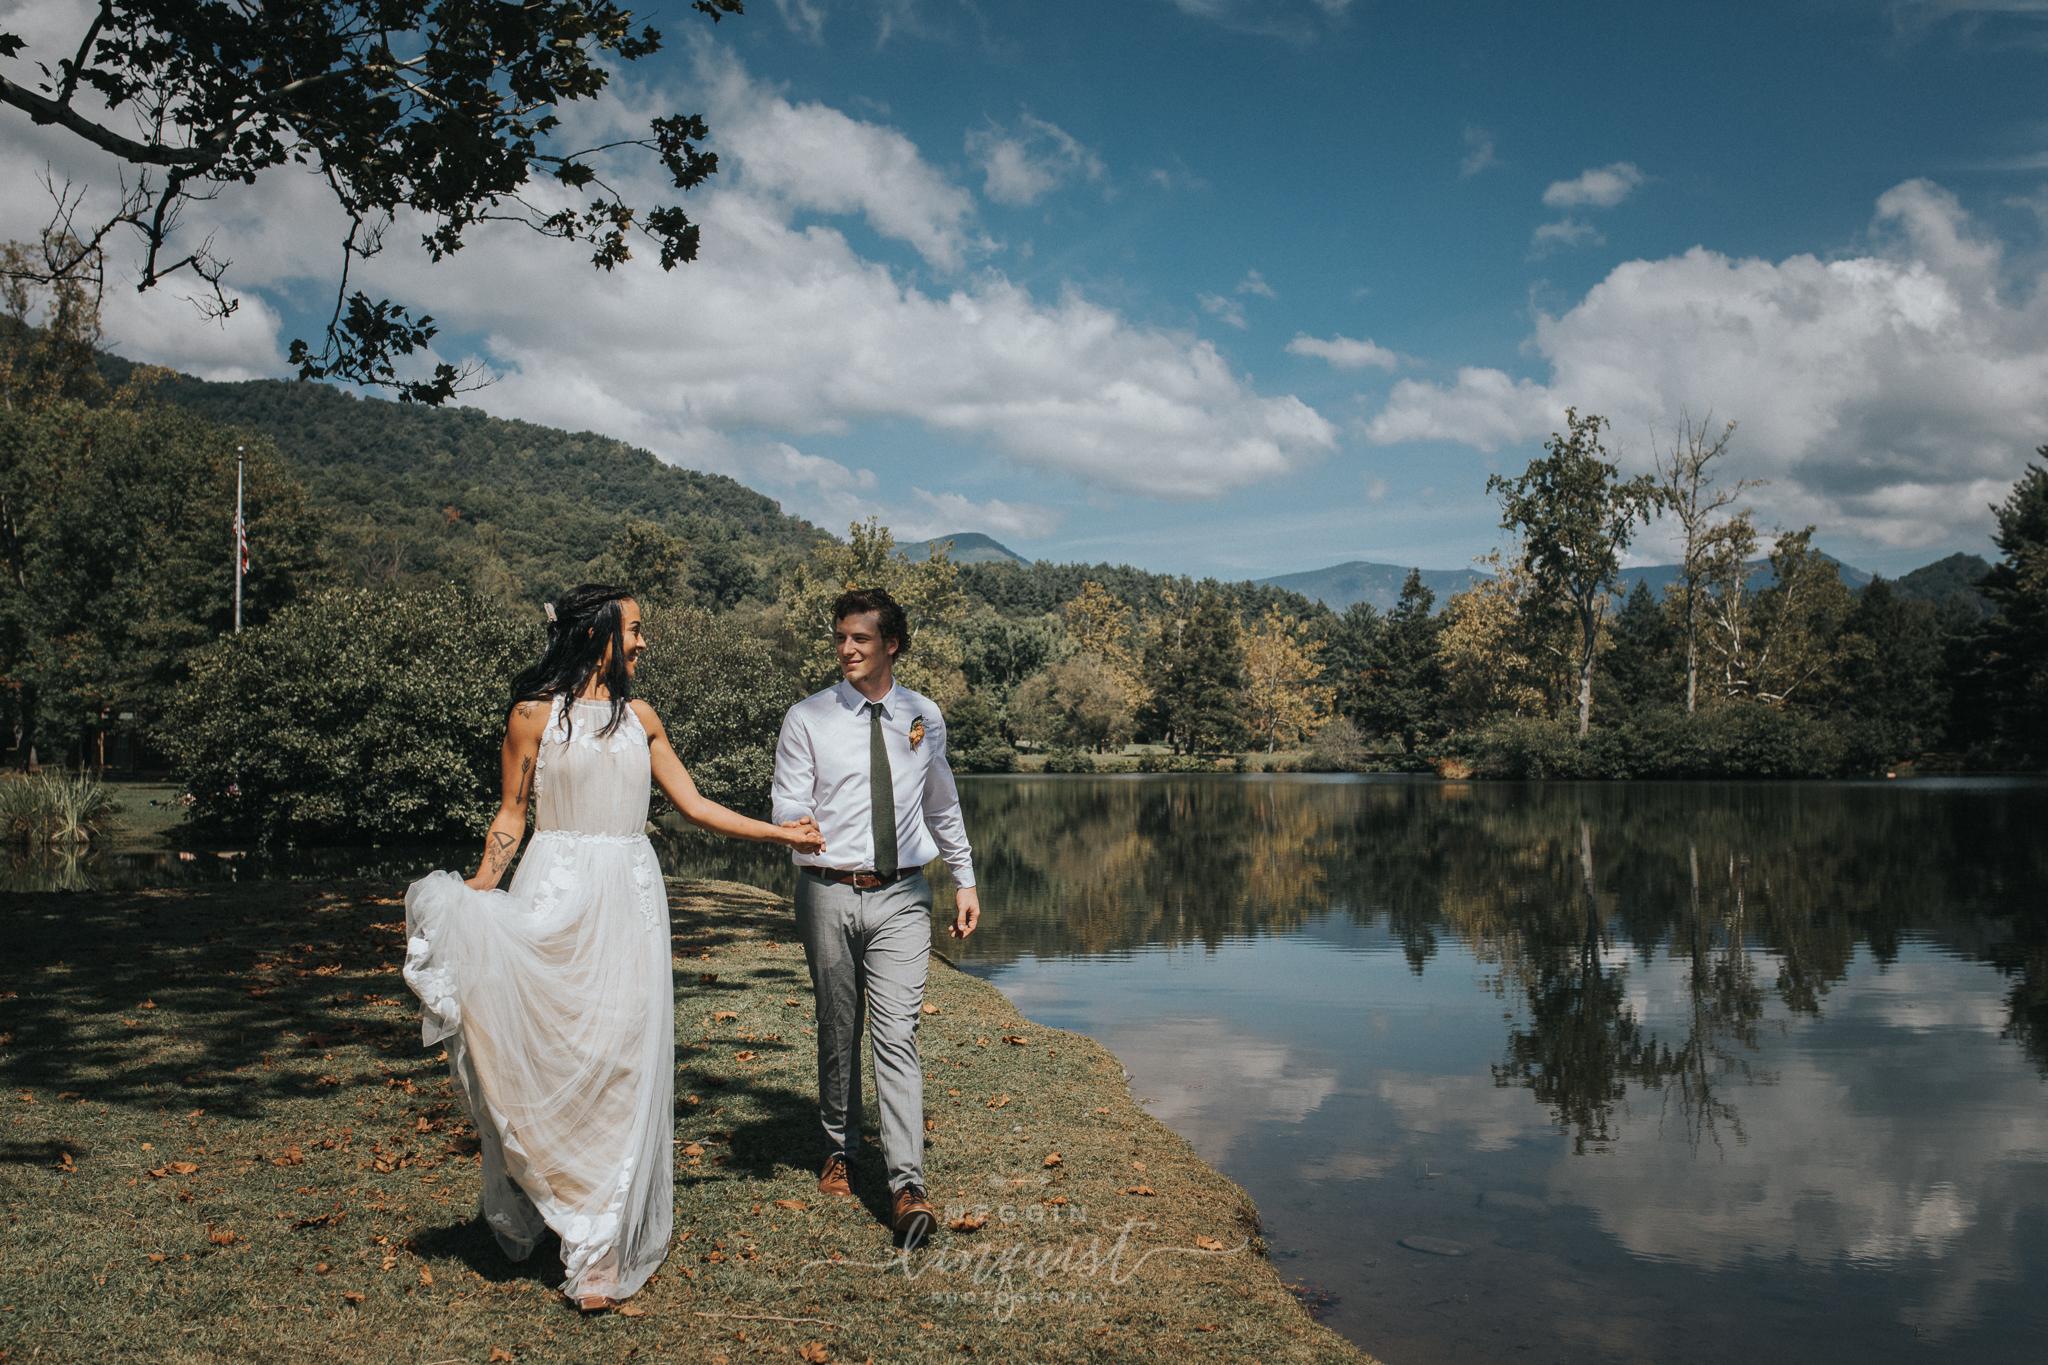 vintage-themed-wedding-reno-lake-tahoe-wedding-photographer-43.jpg